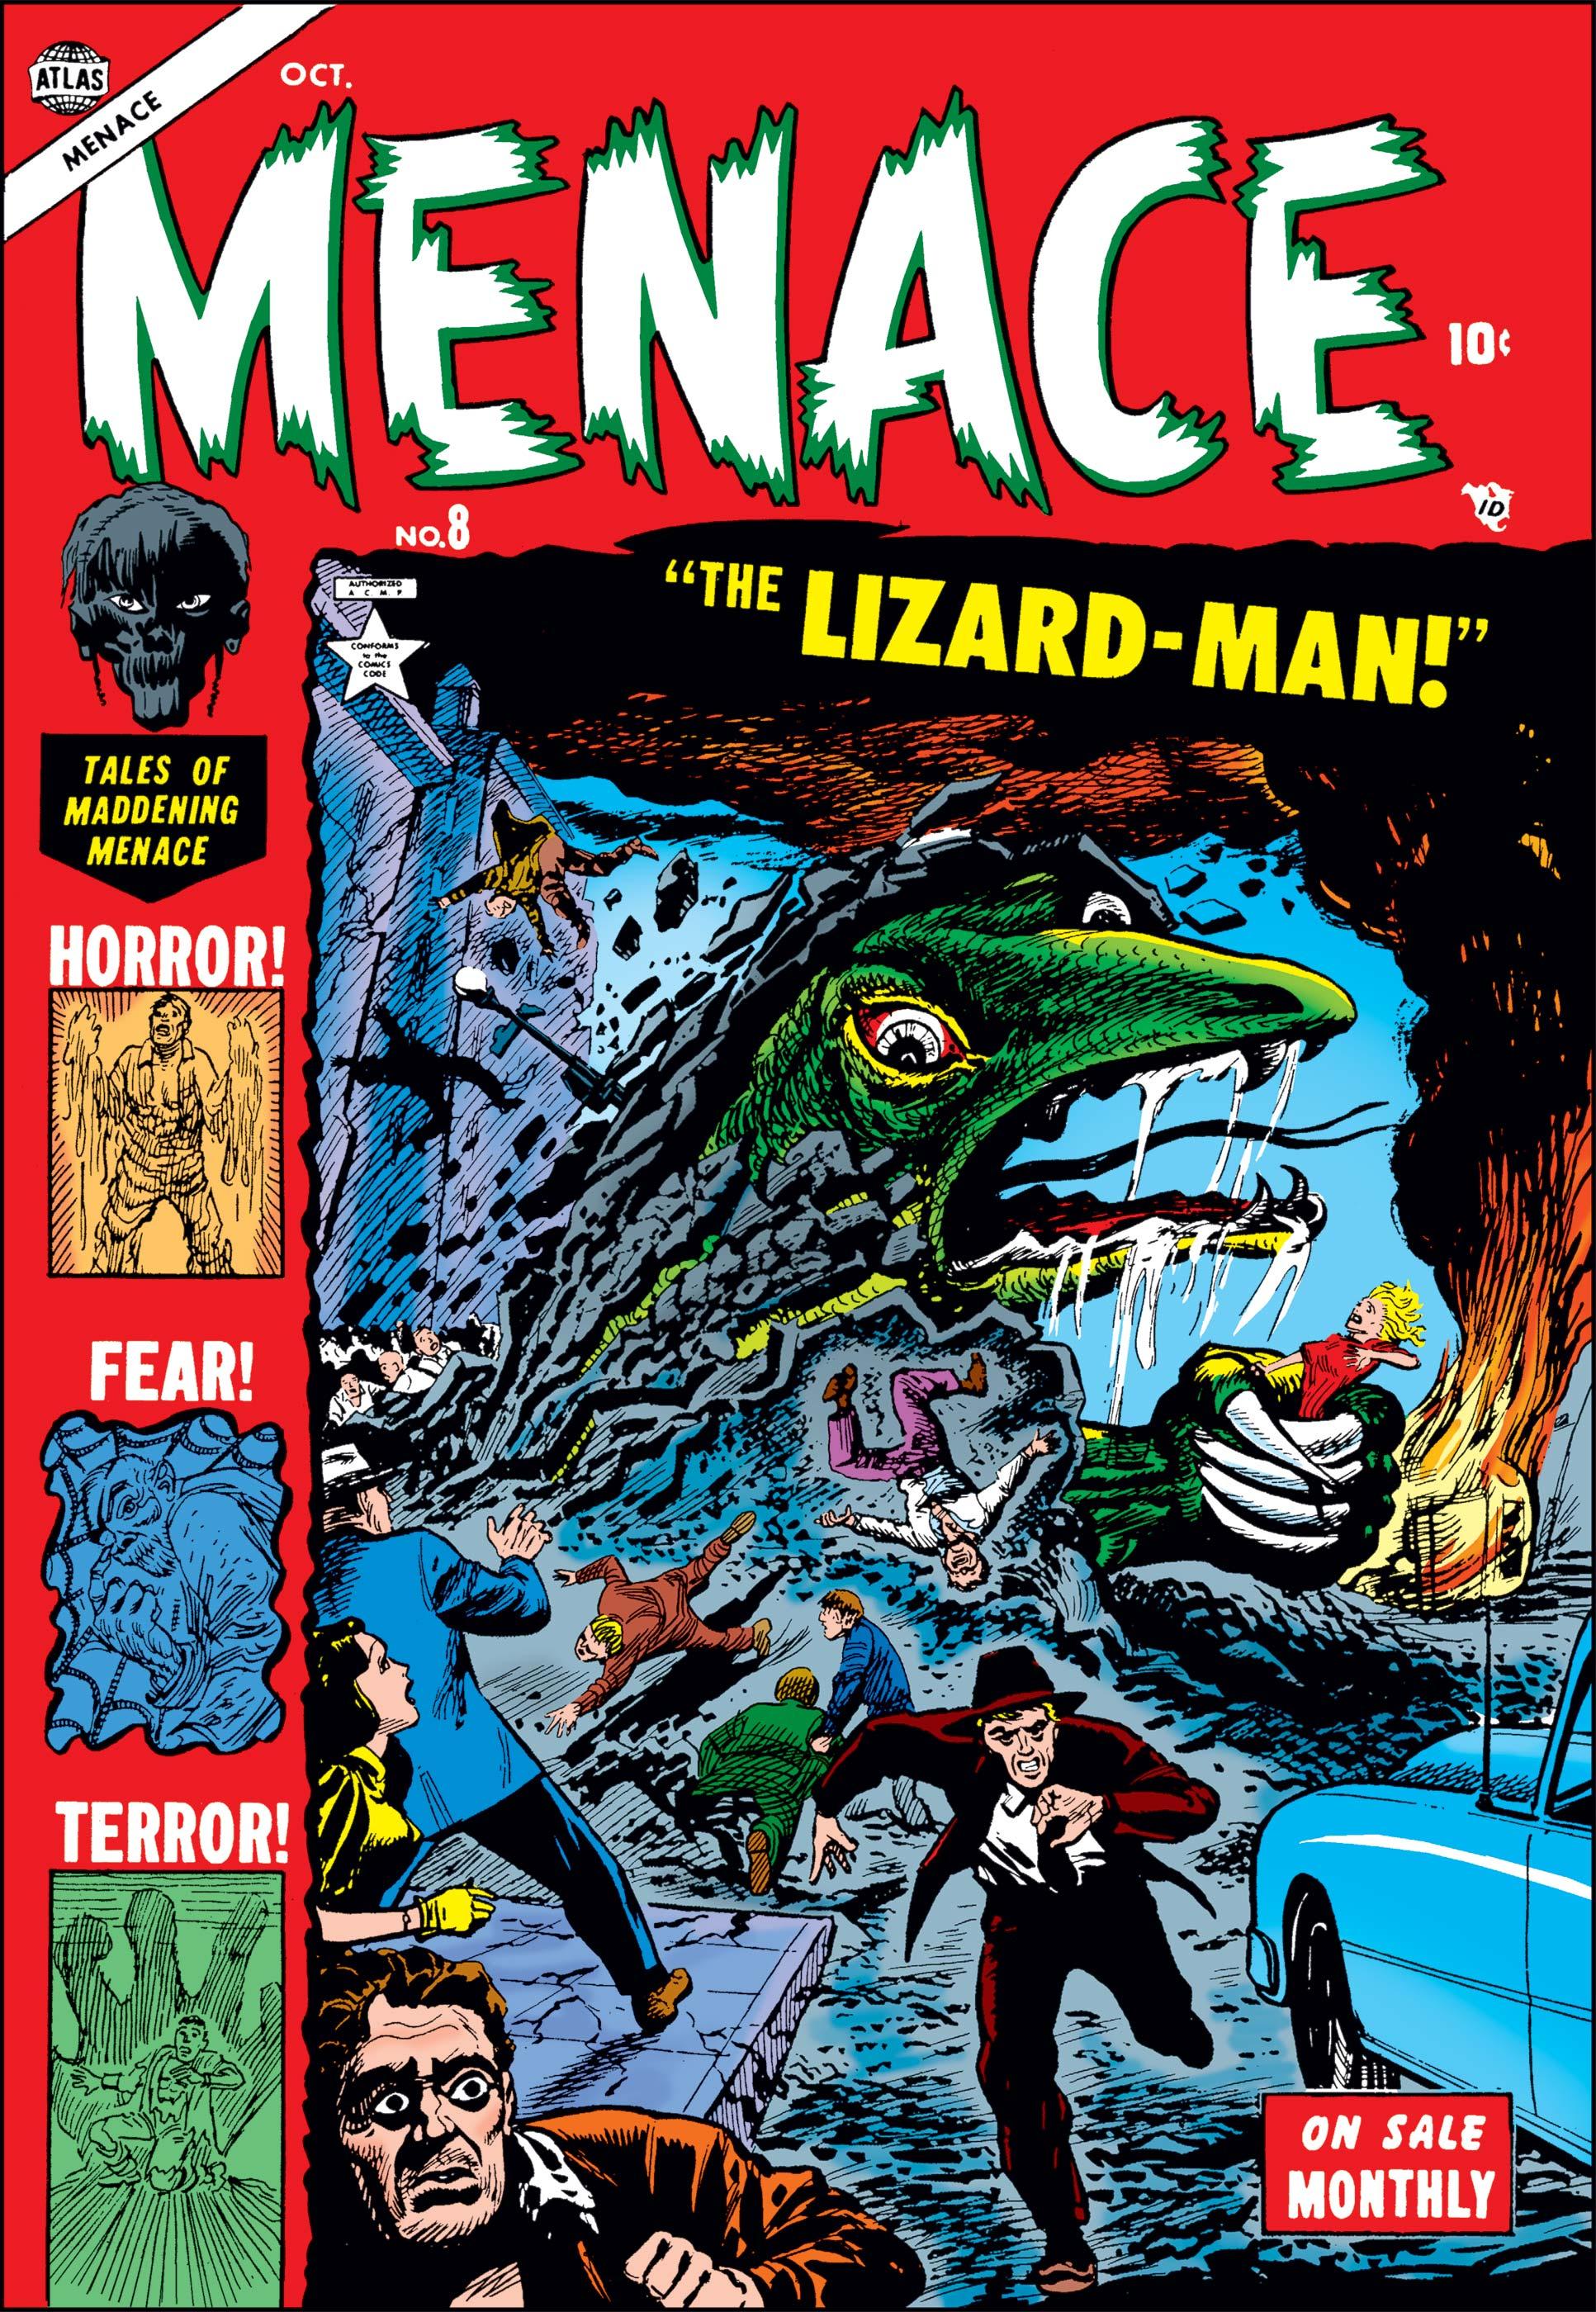 Menace (1953) #8